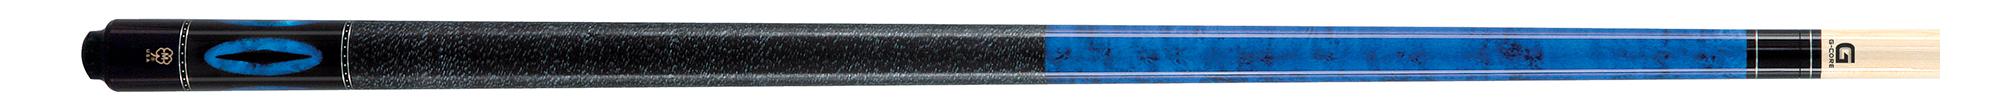 PK3008: McDermott G211 Pacific Blue/inlay pool Gewicht: 19Oz #1